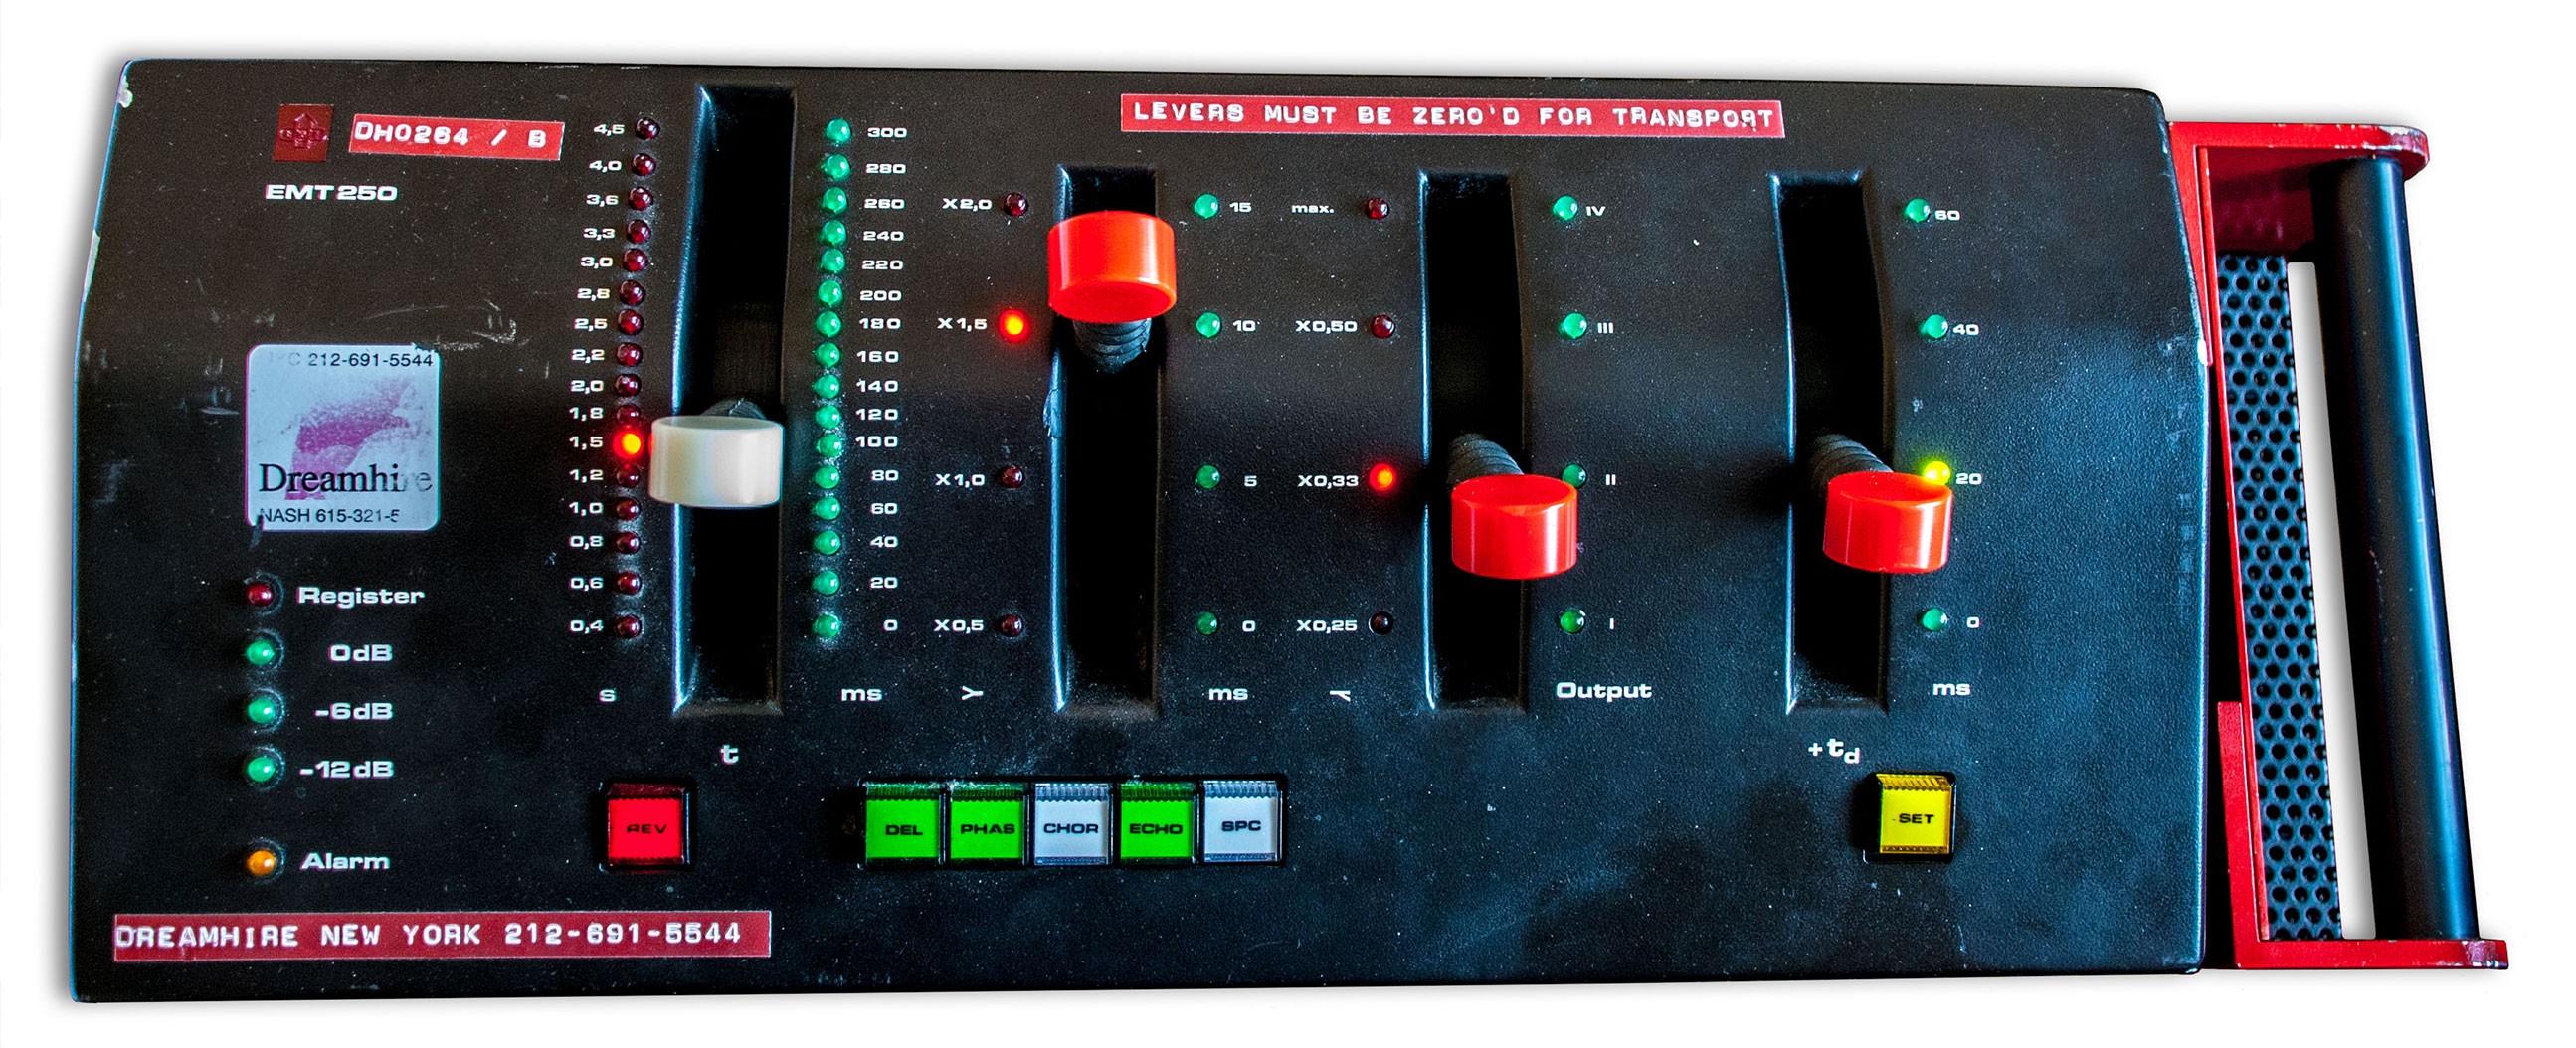 Altiverb 7 增加 EMT250 混响采样